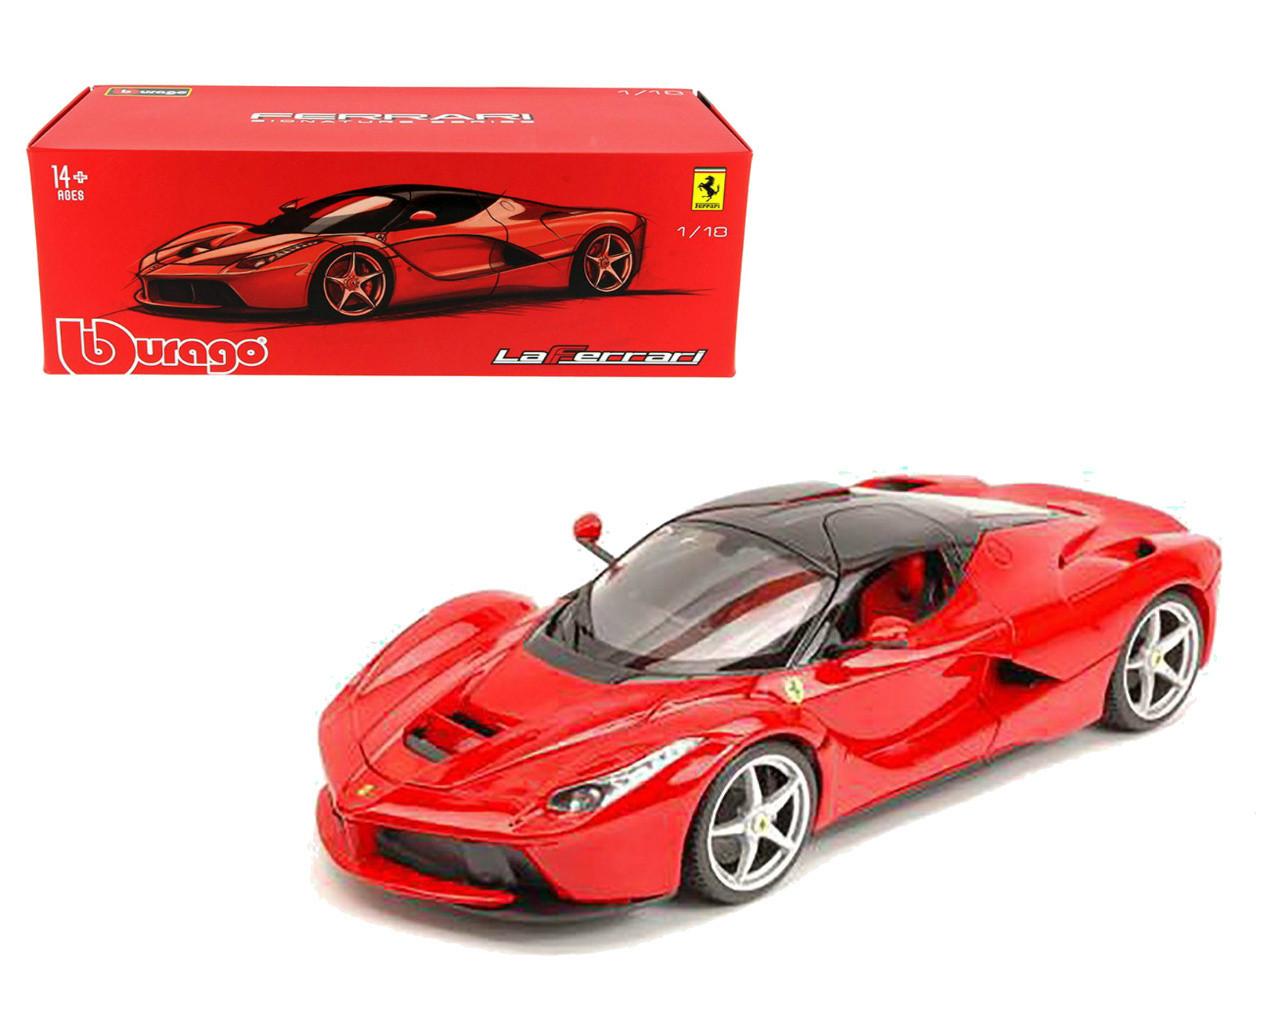 Ferrari Laferrari F70 Red 1 18 Scale Diecast Car Model Signature Series By Bburago 16901